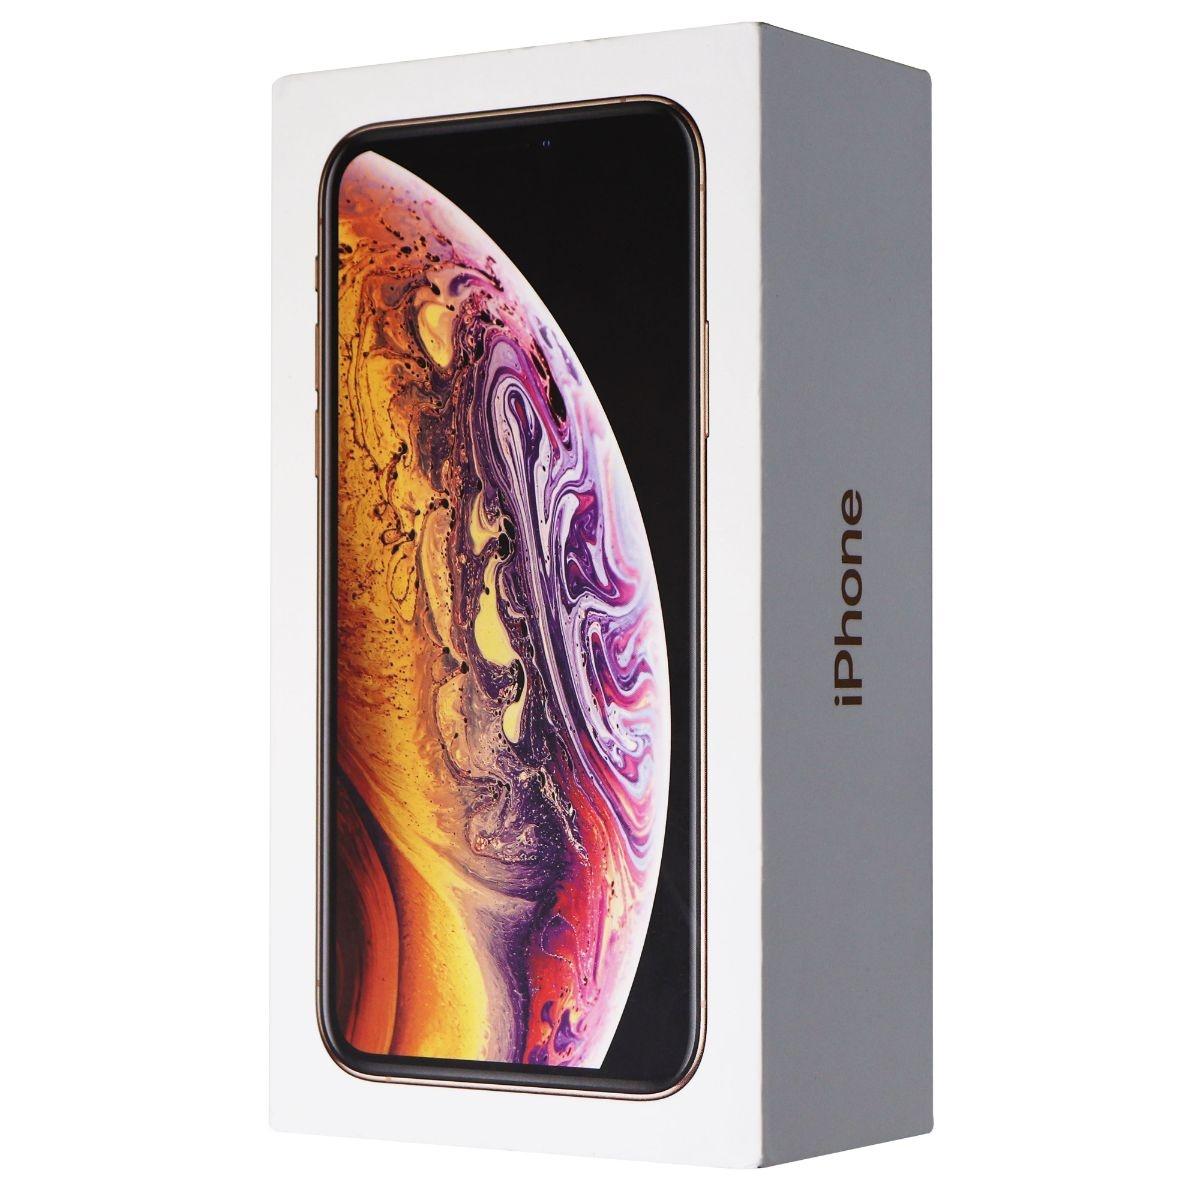 RETAIL BOX - Apple iPhone Xs - 64GB / Gold - NO DEVICE